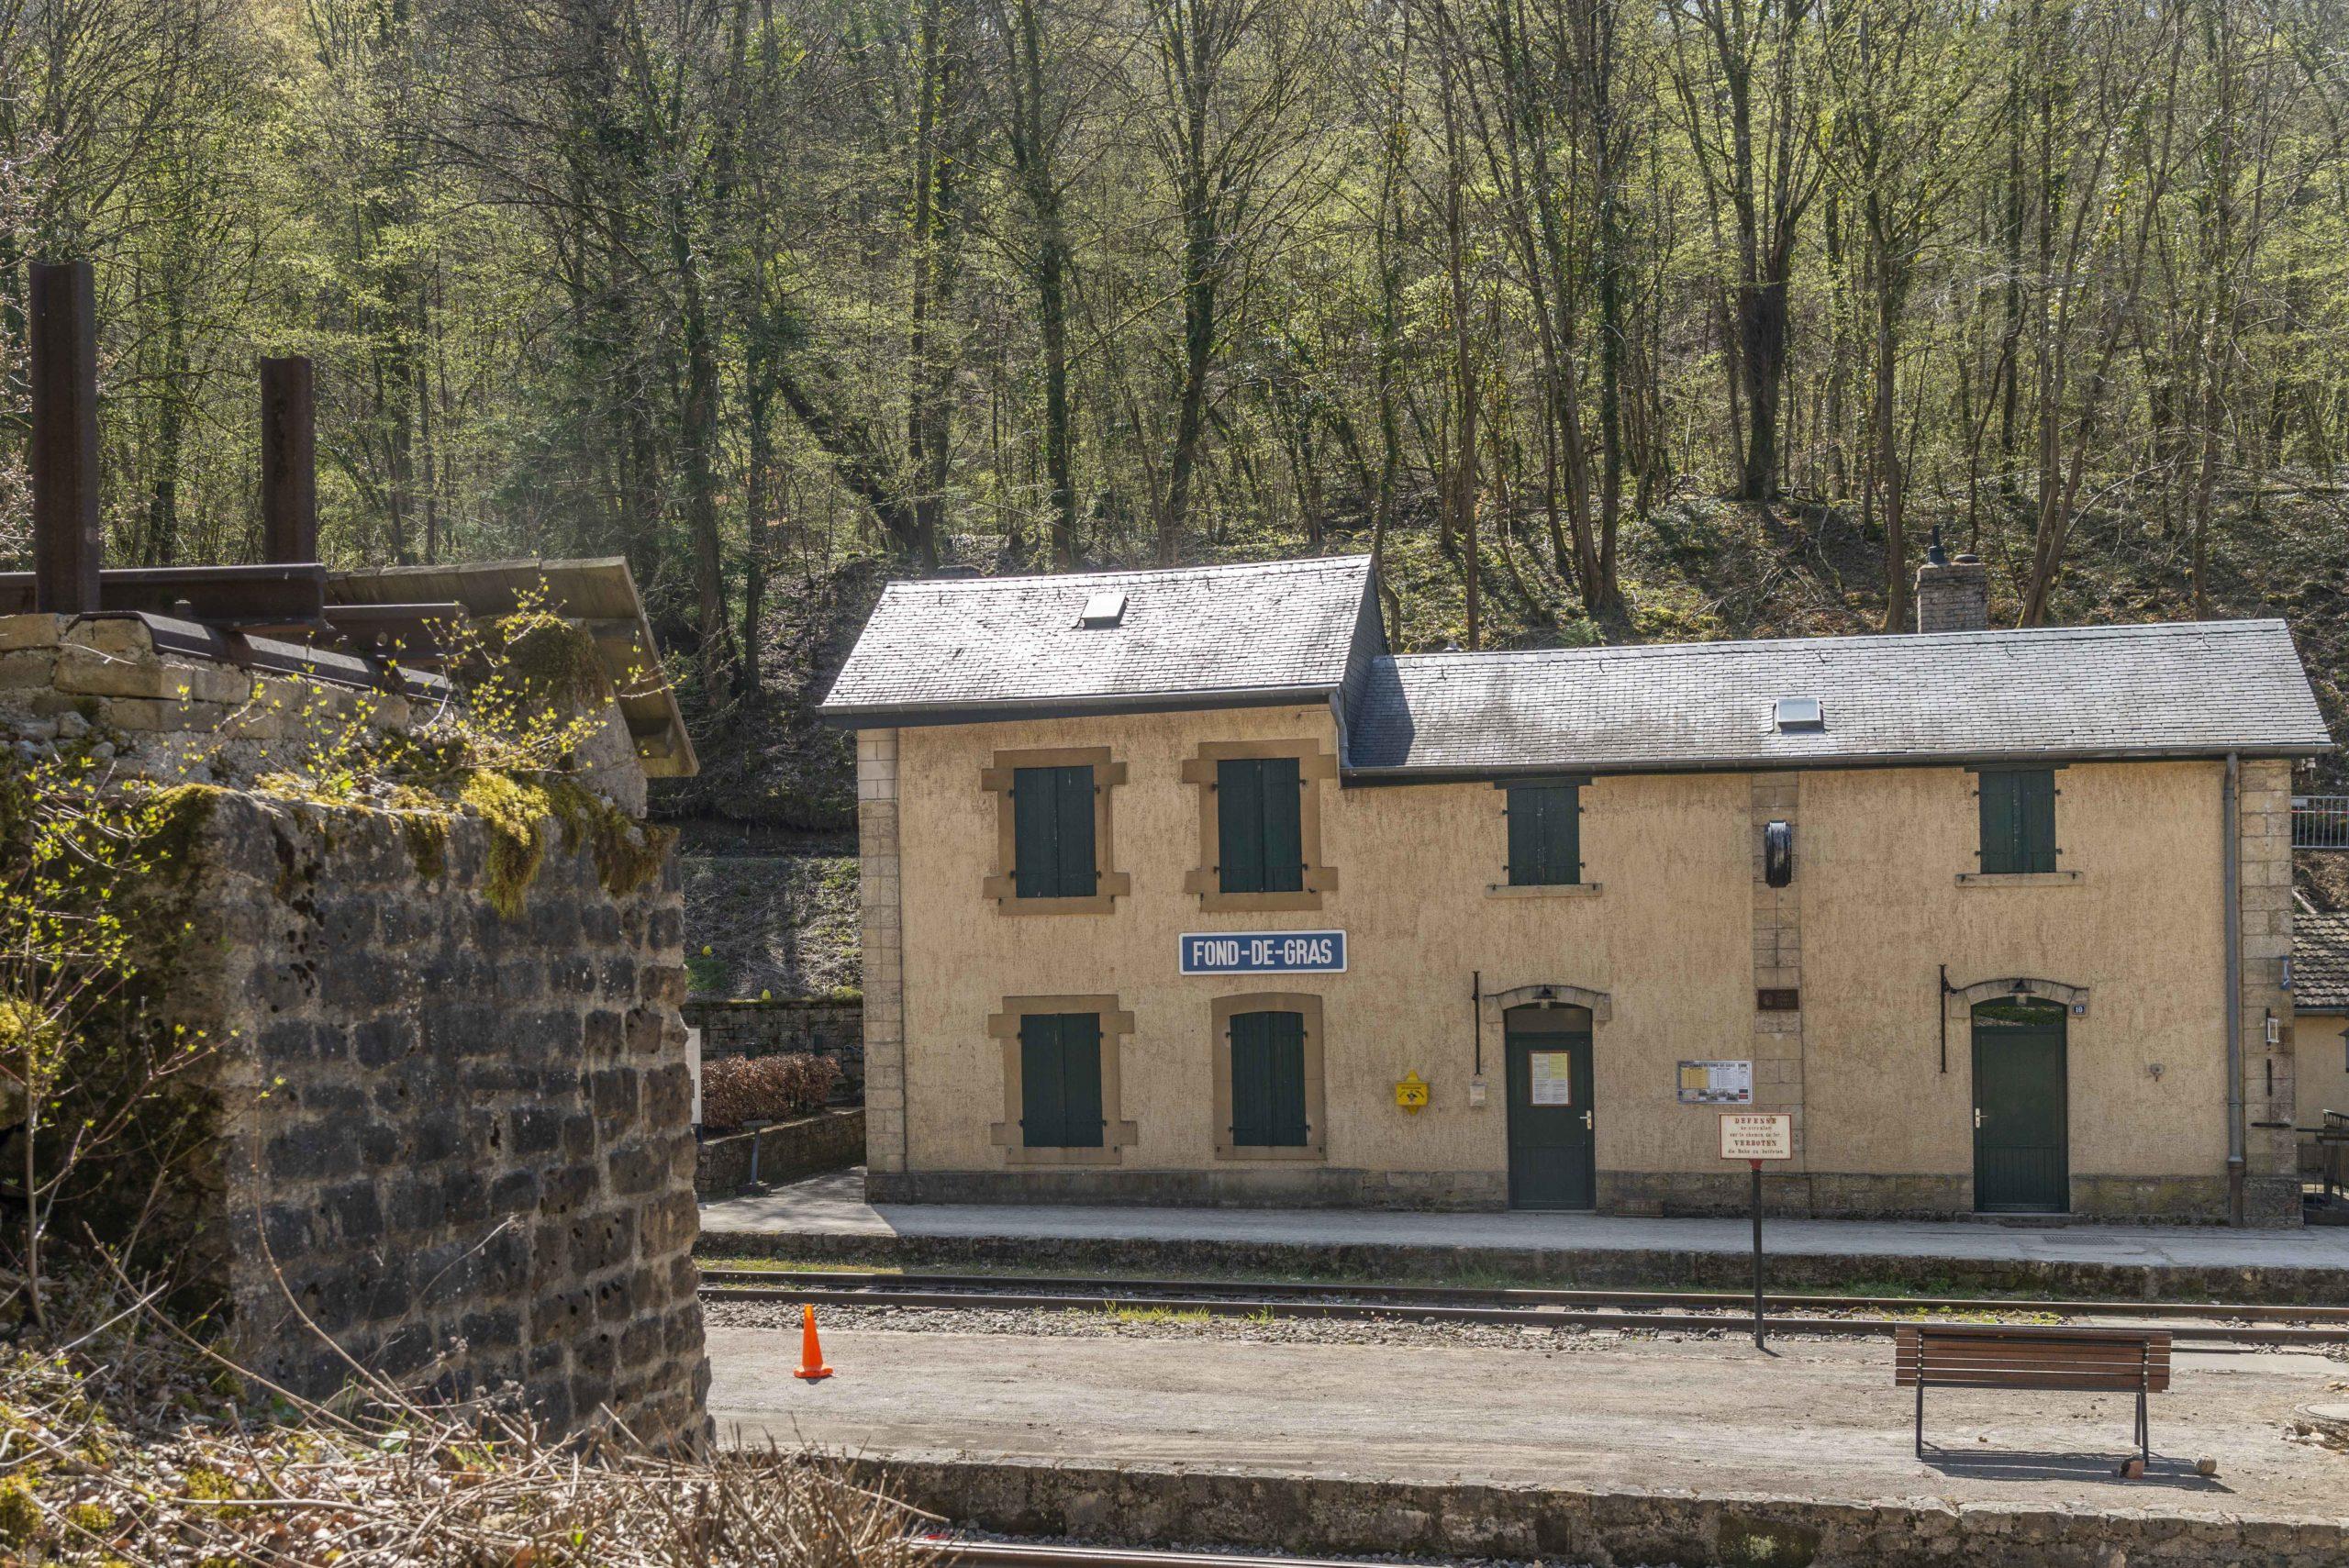 alter Bahnhof in Fond-de-Gras Luxemburg